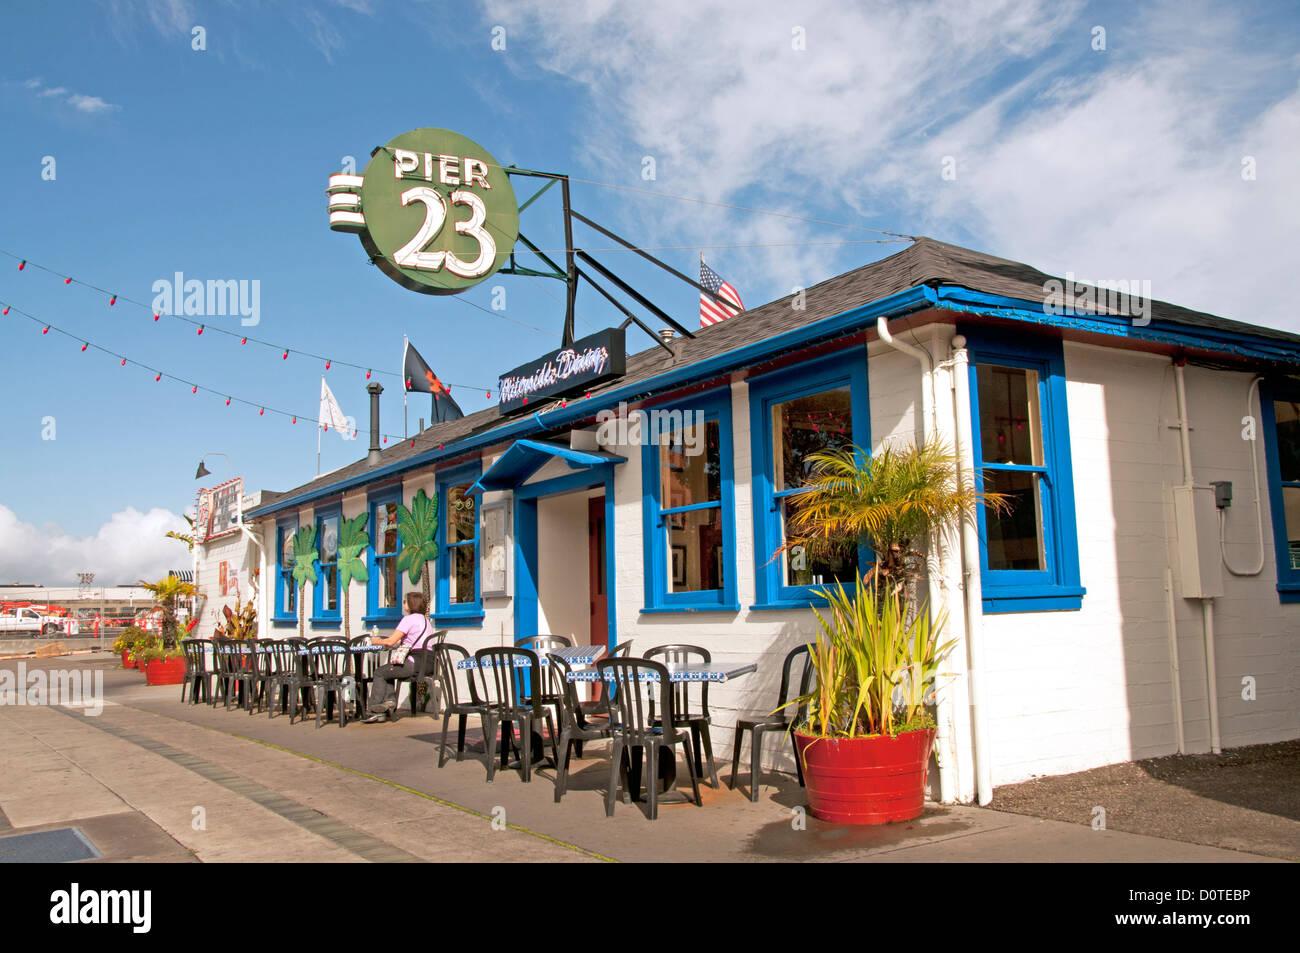 Pier 23 restaurant exterior - Stock Image